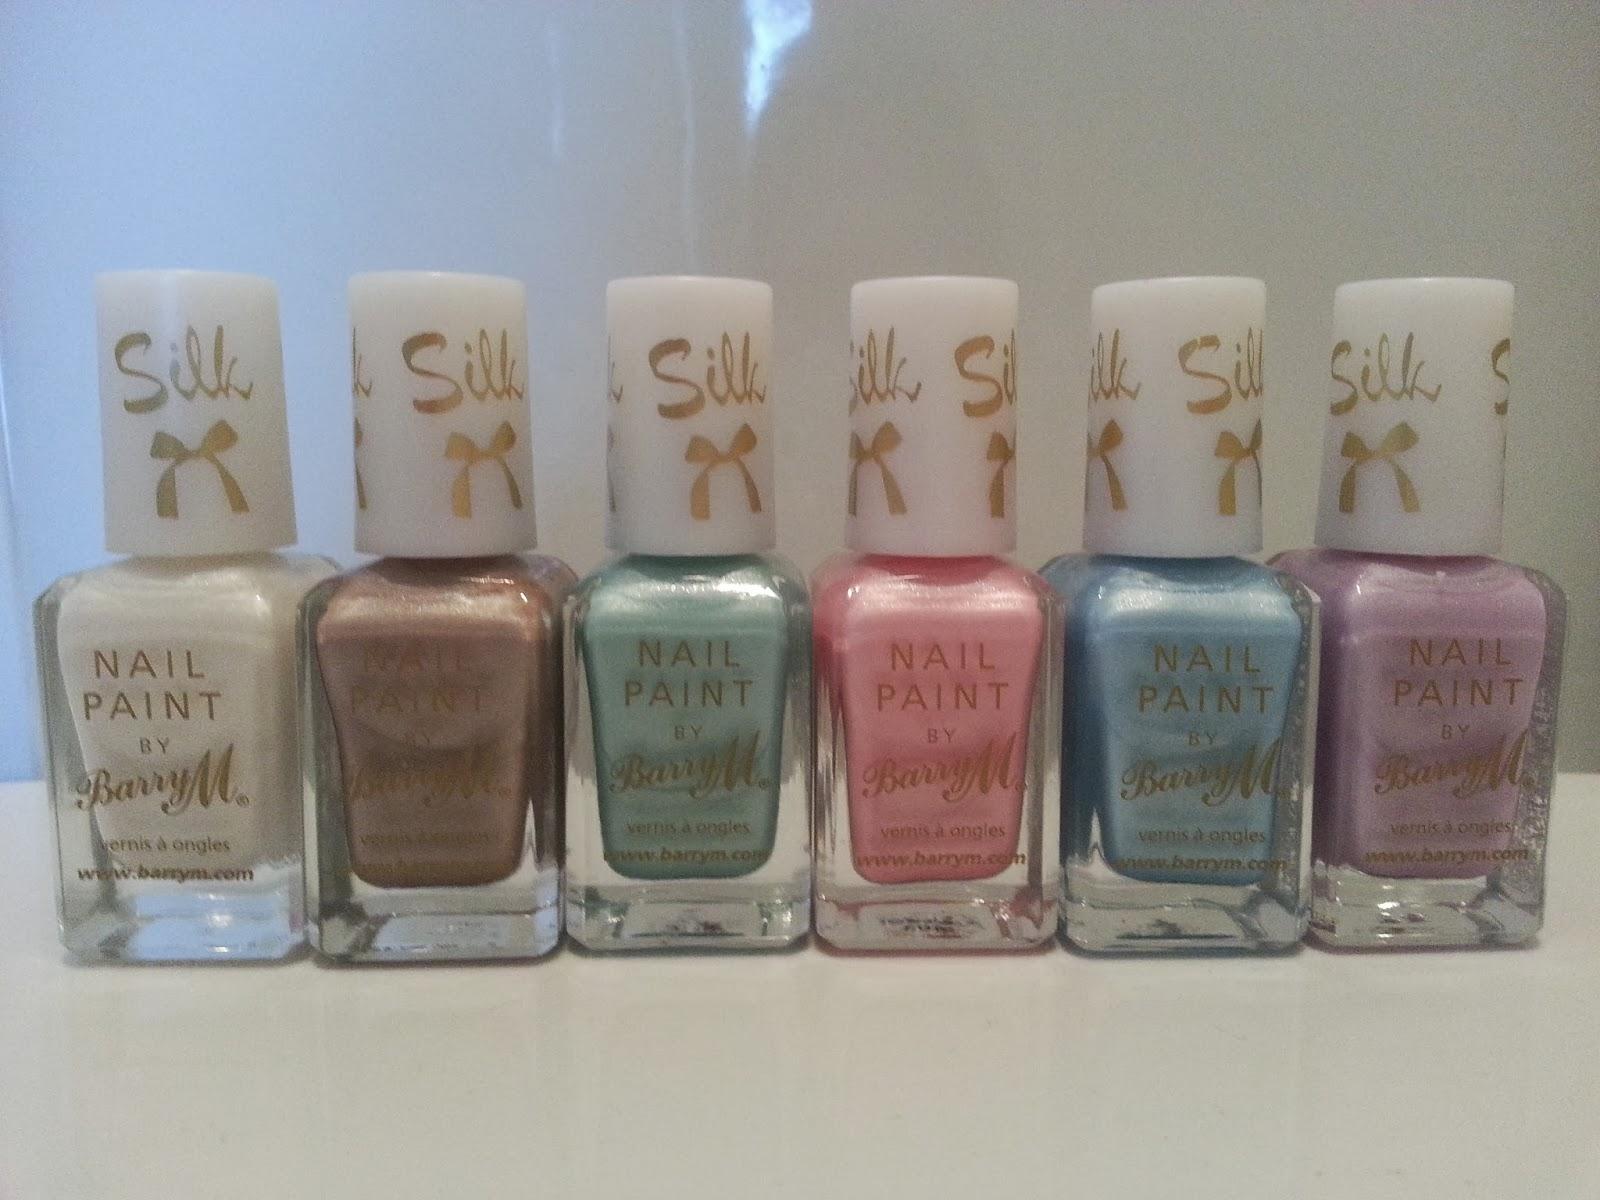 barry-m-silk-polish-collection